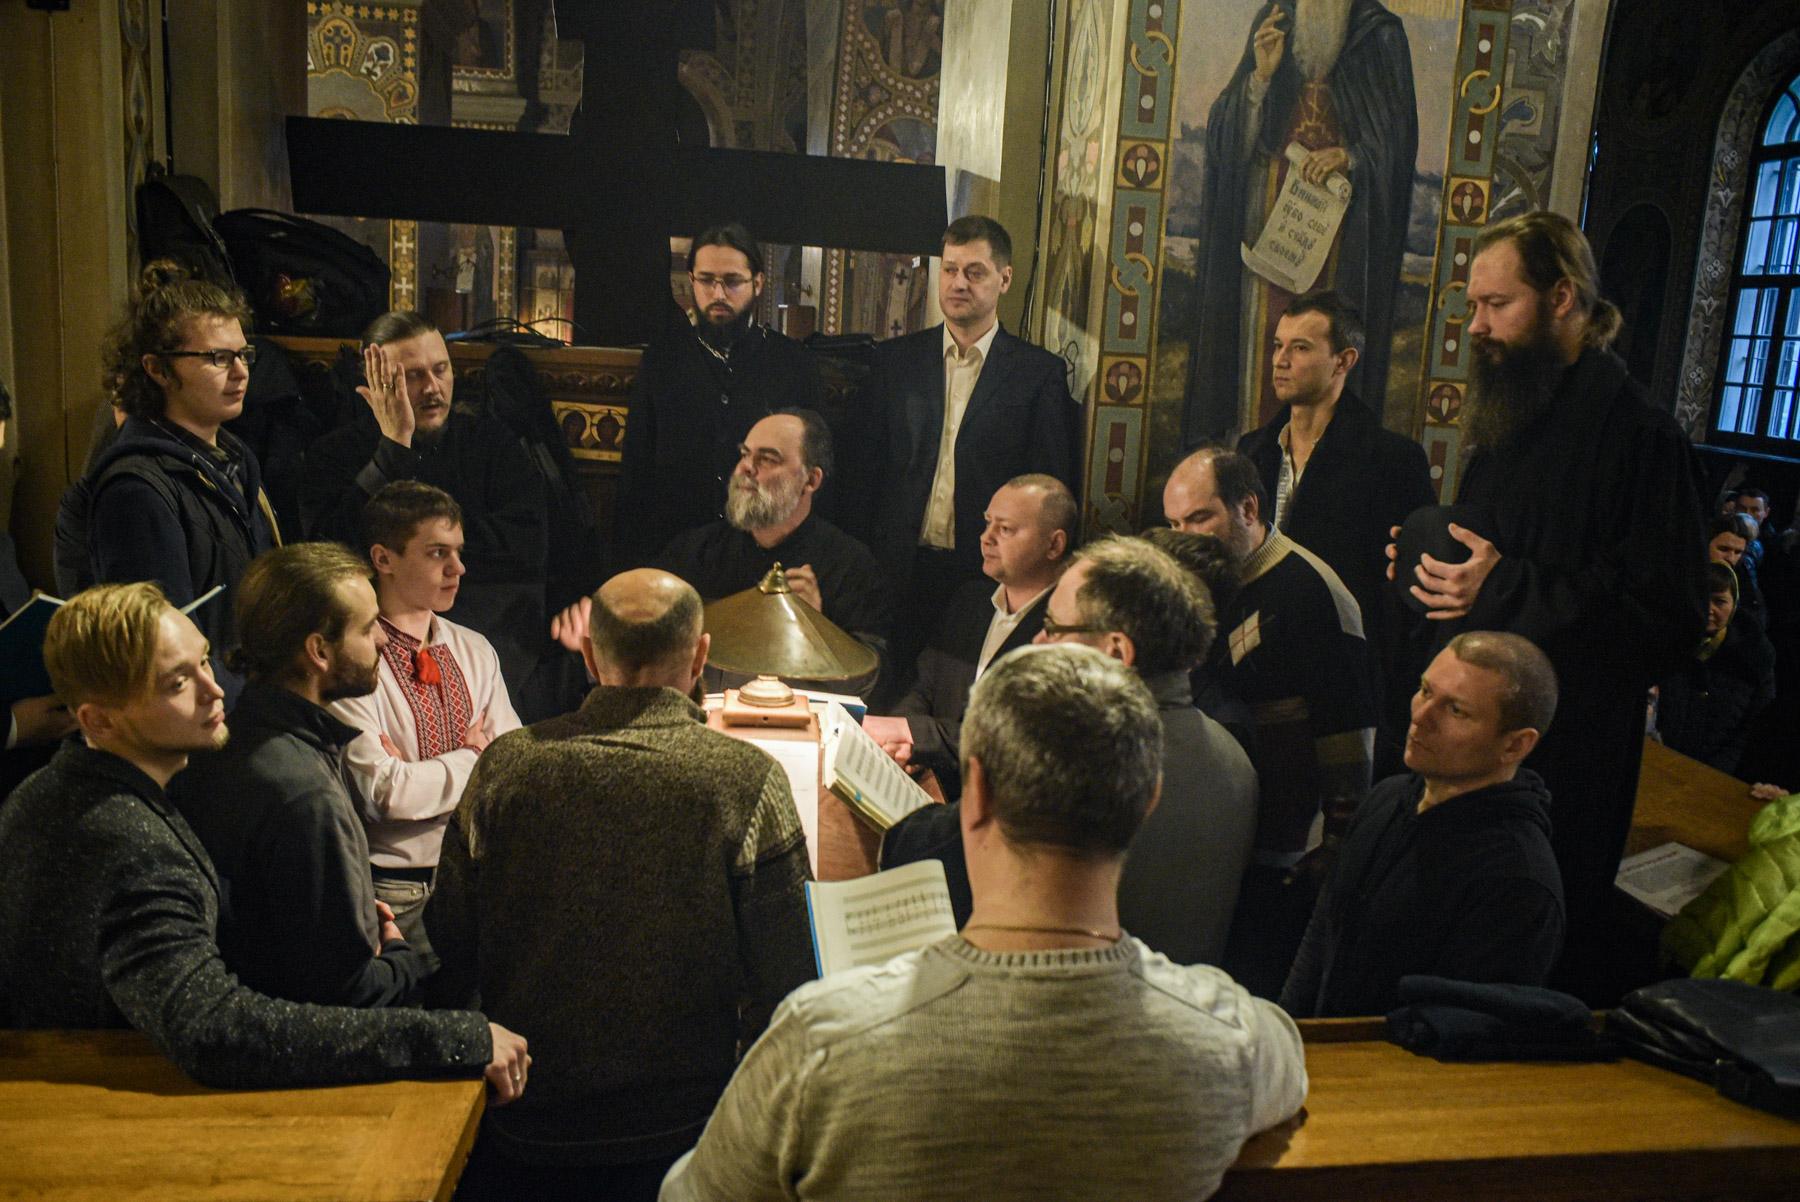 photos of orthodox christmas 0165 2